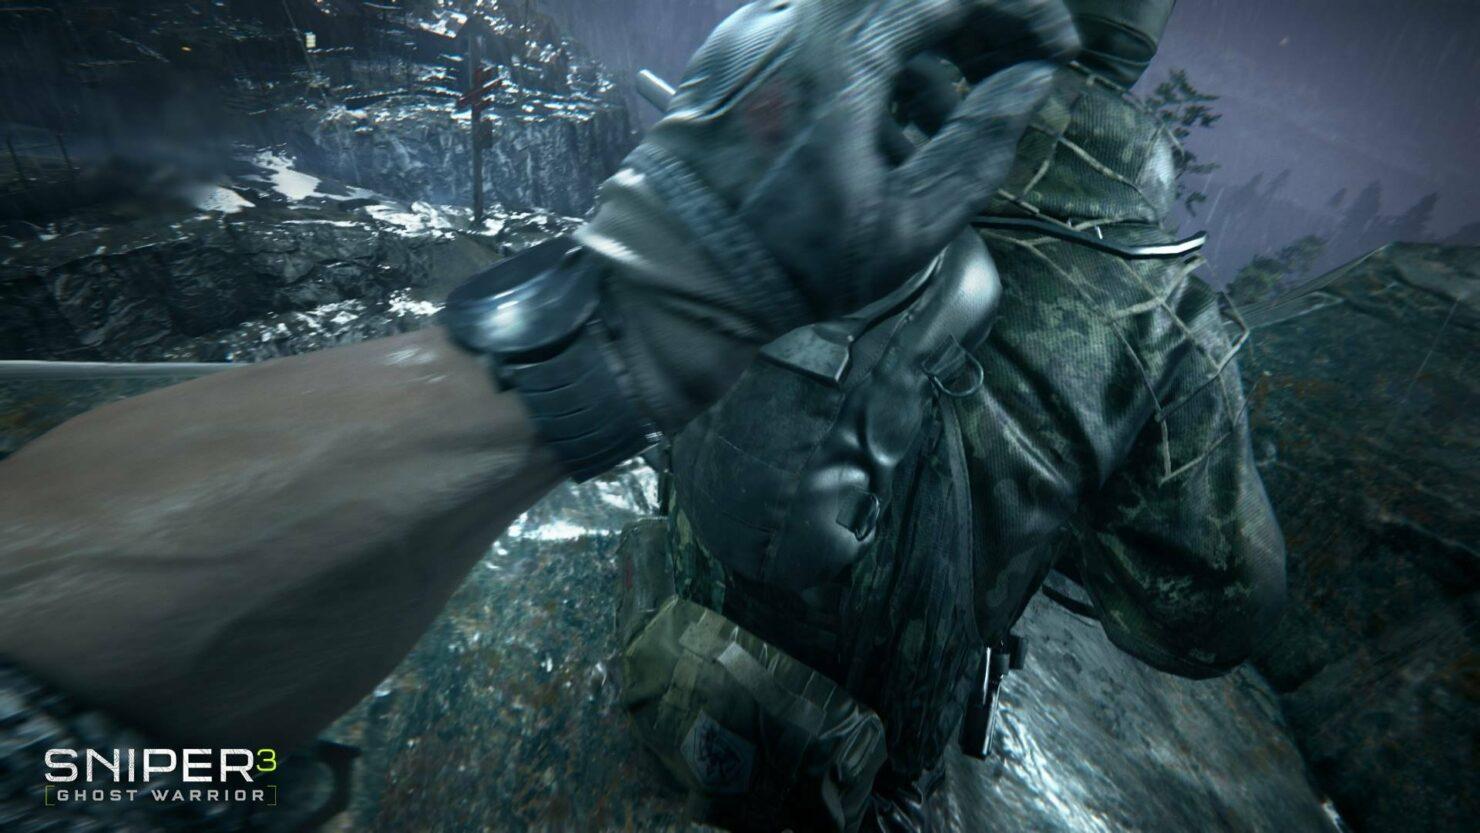 sniper-ghost-warrior-3-2